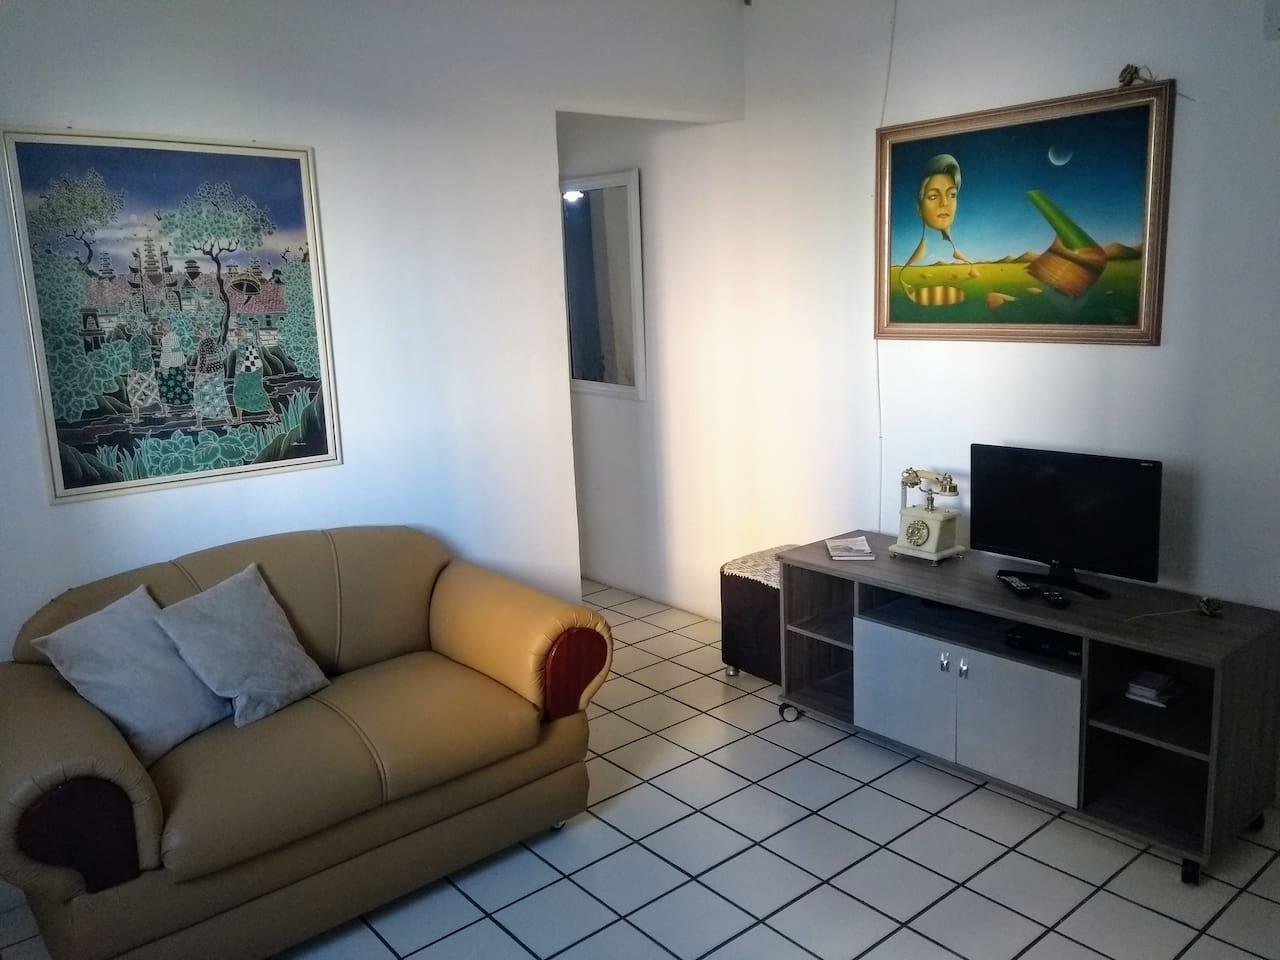 Sala com sofá, tv a cabo e wi-fi.